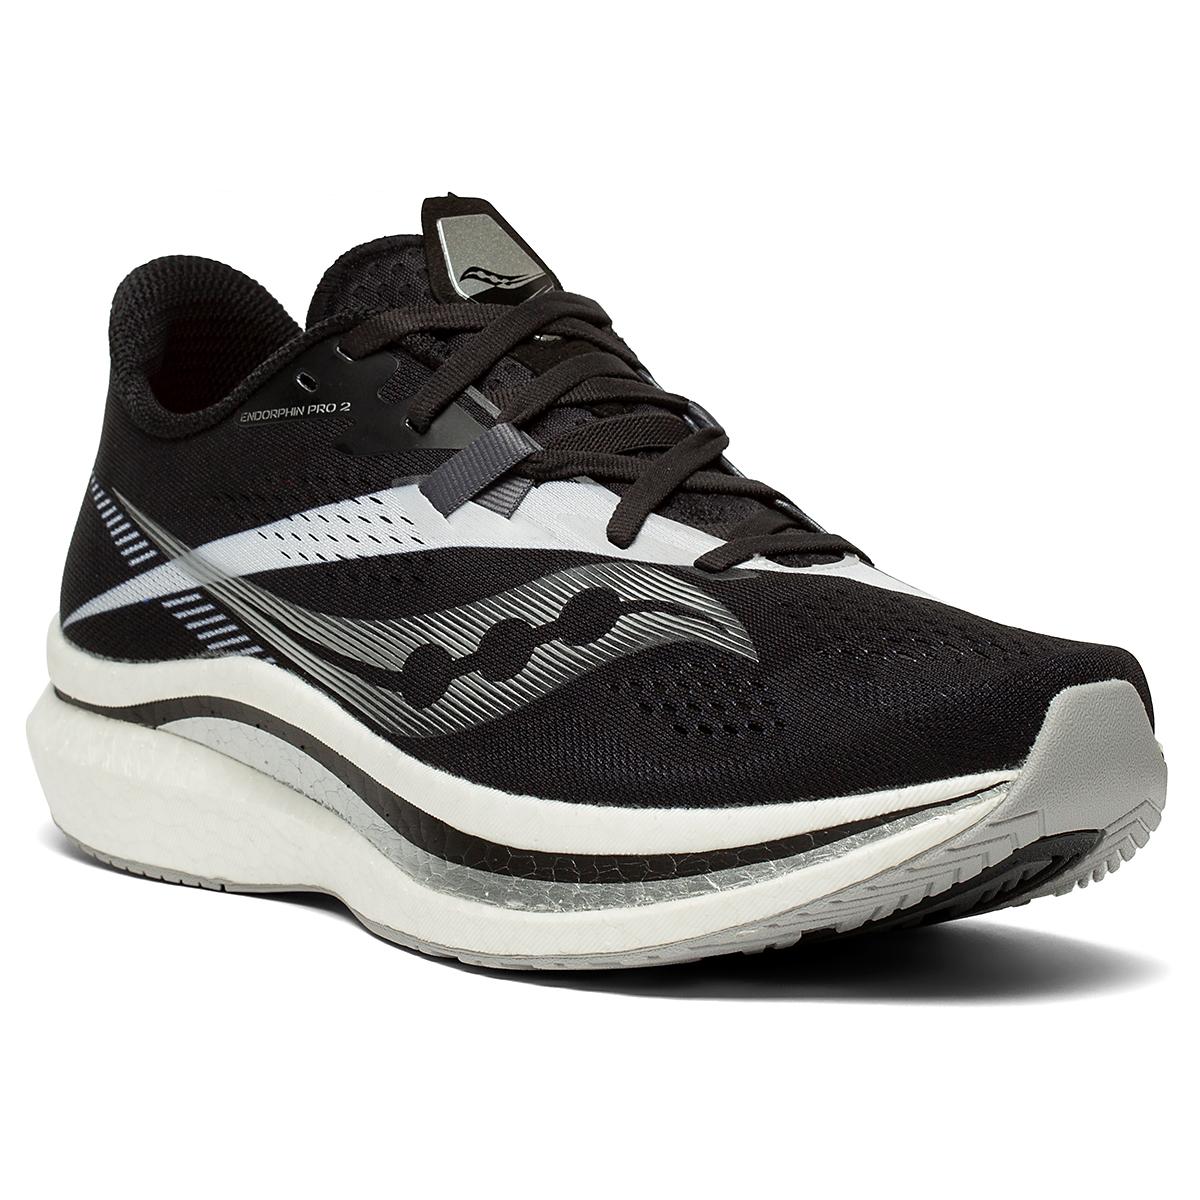 Men's Saucony Endorphin Pro 2 Running Shoe - Color: Black/White - Size: 7 - Width: Regular, Black/White, large, image 5